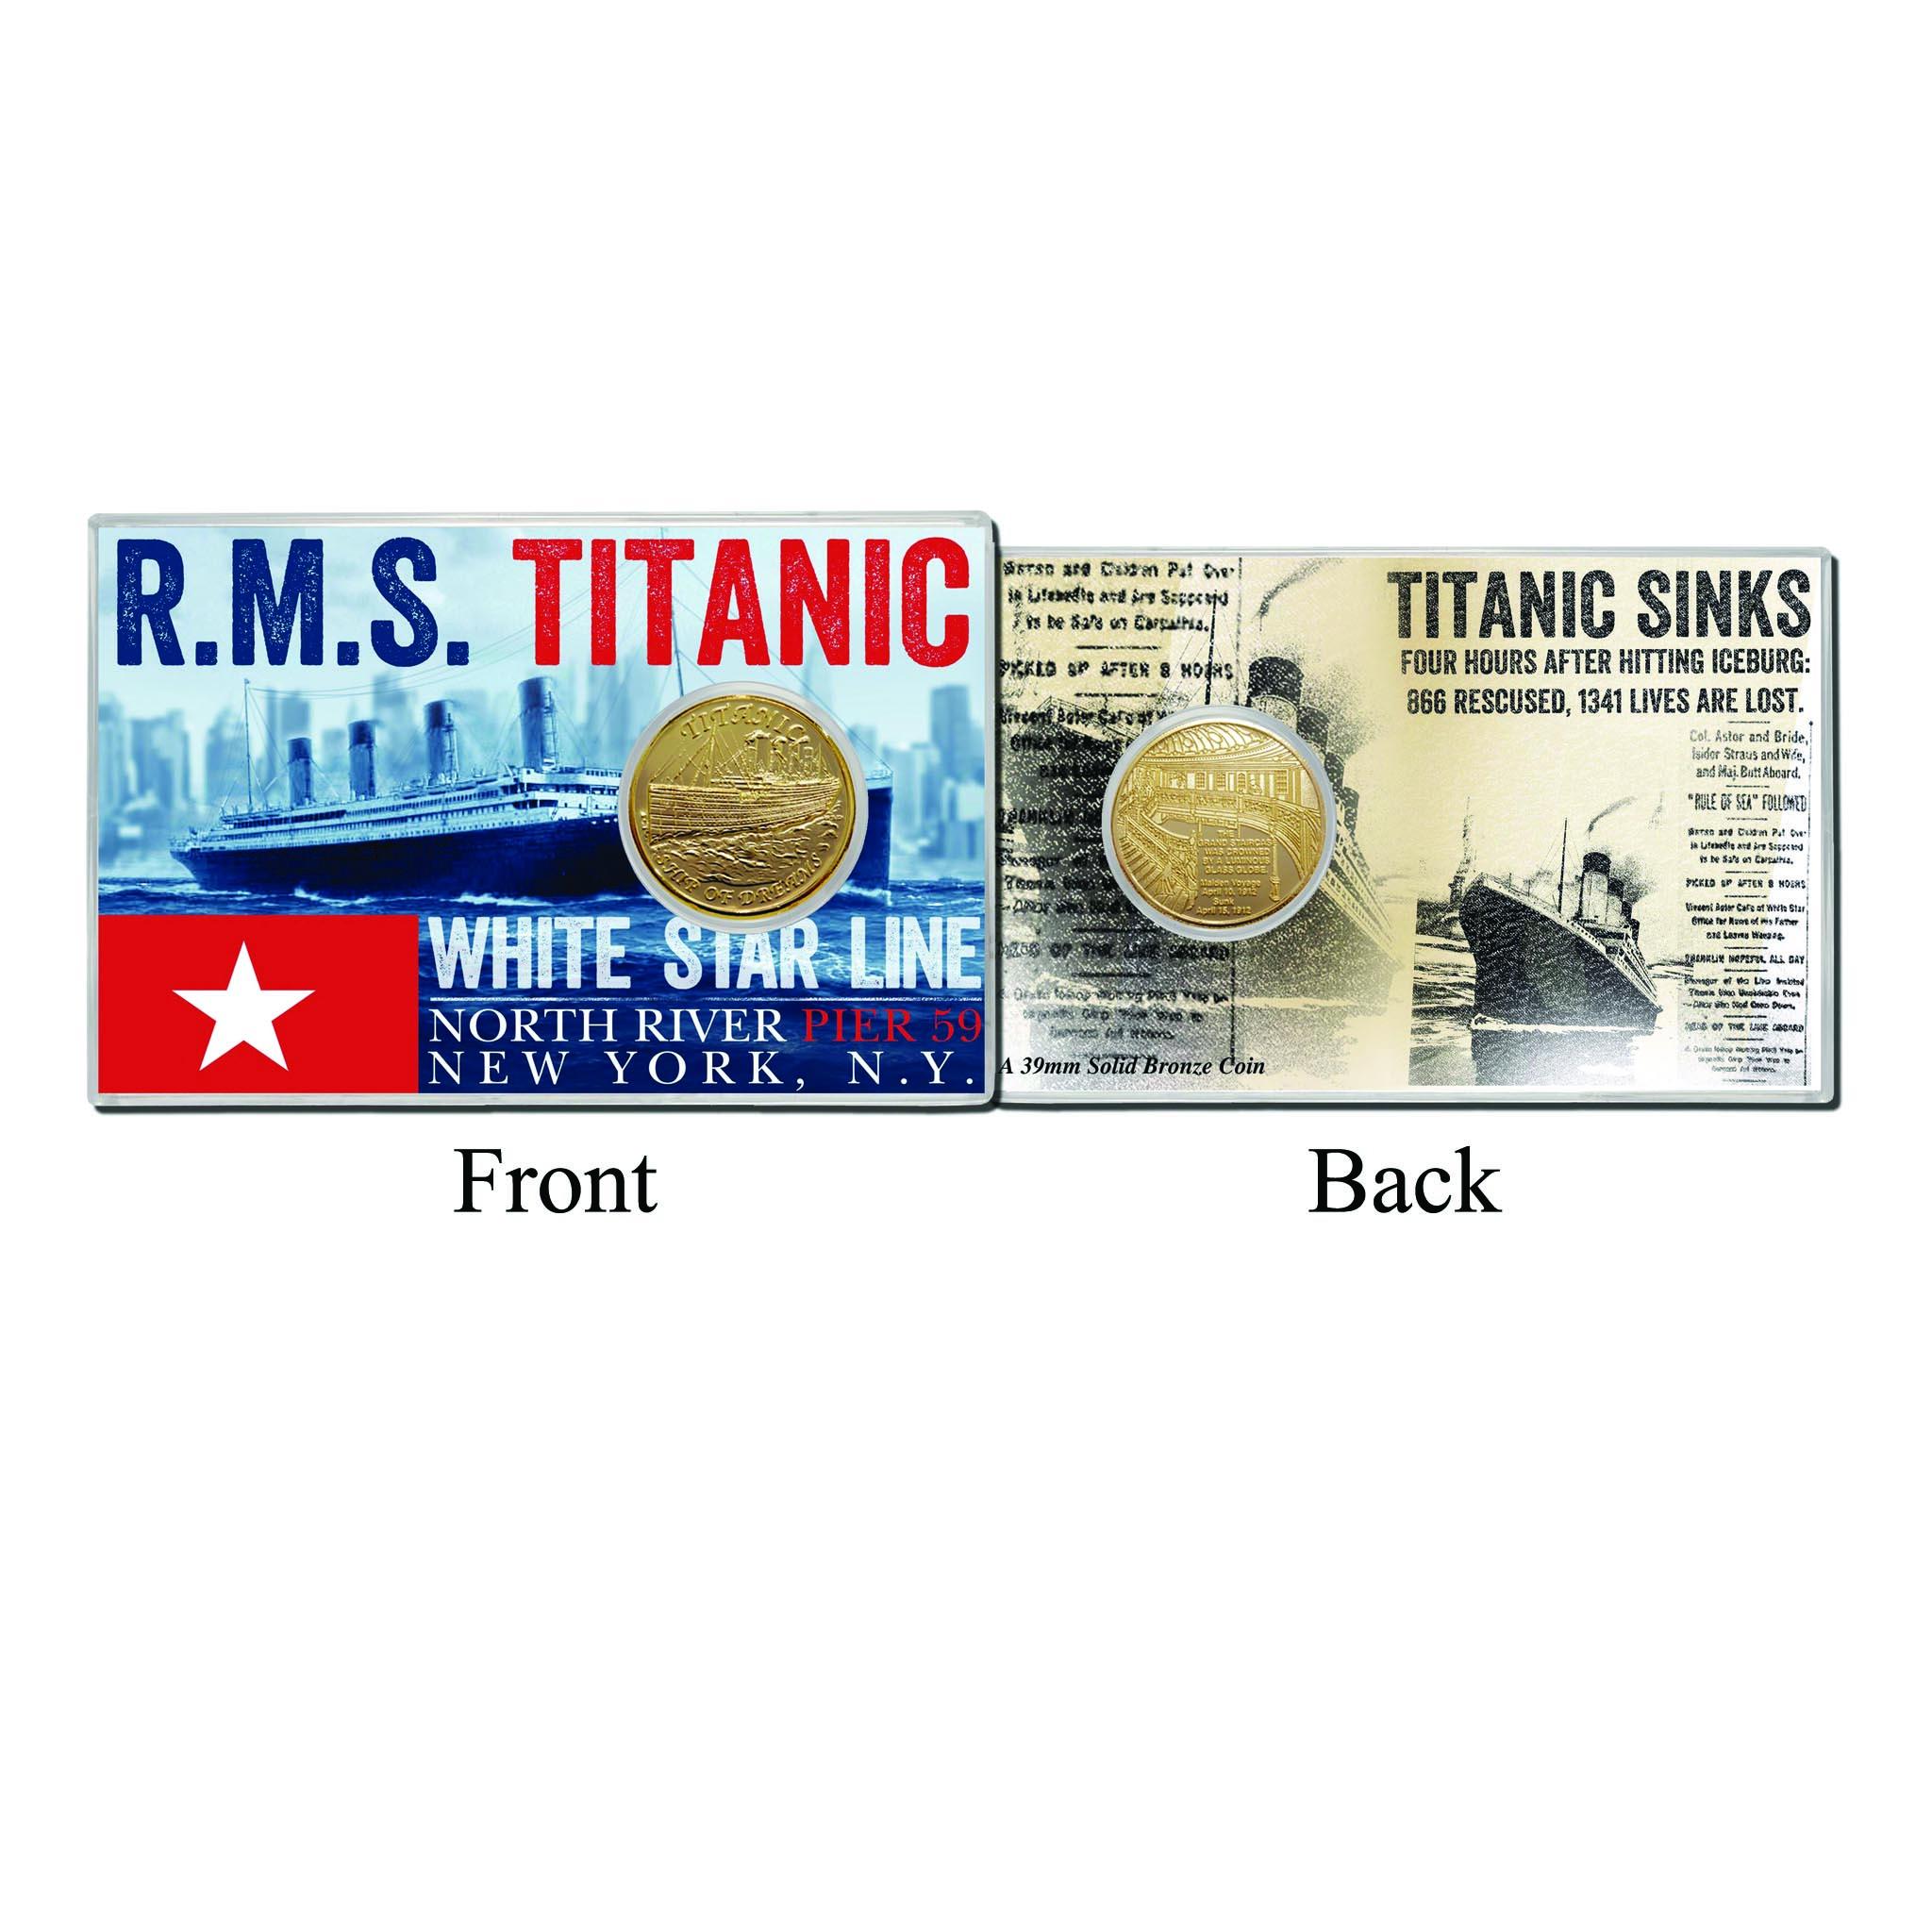 Titanic Sinks Acrylic w/Minted Coin Card 4 x 6  Bullion Bronze